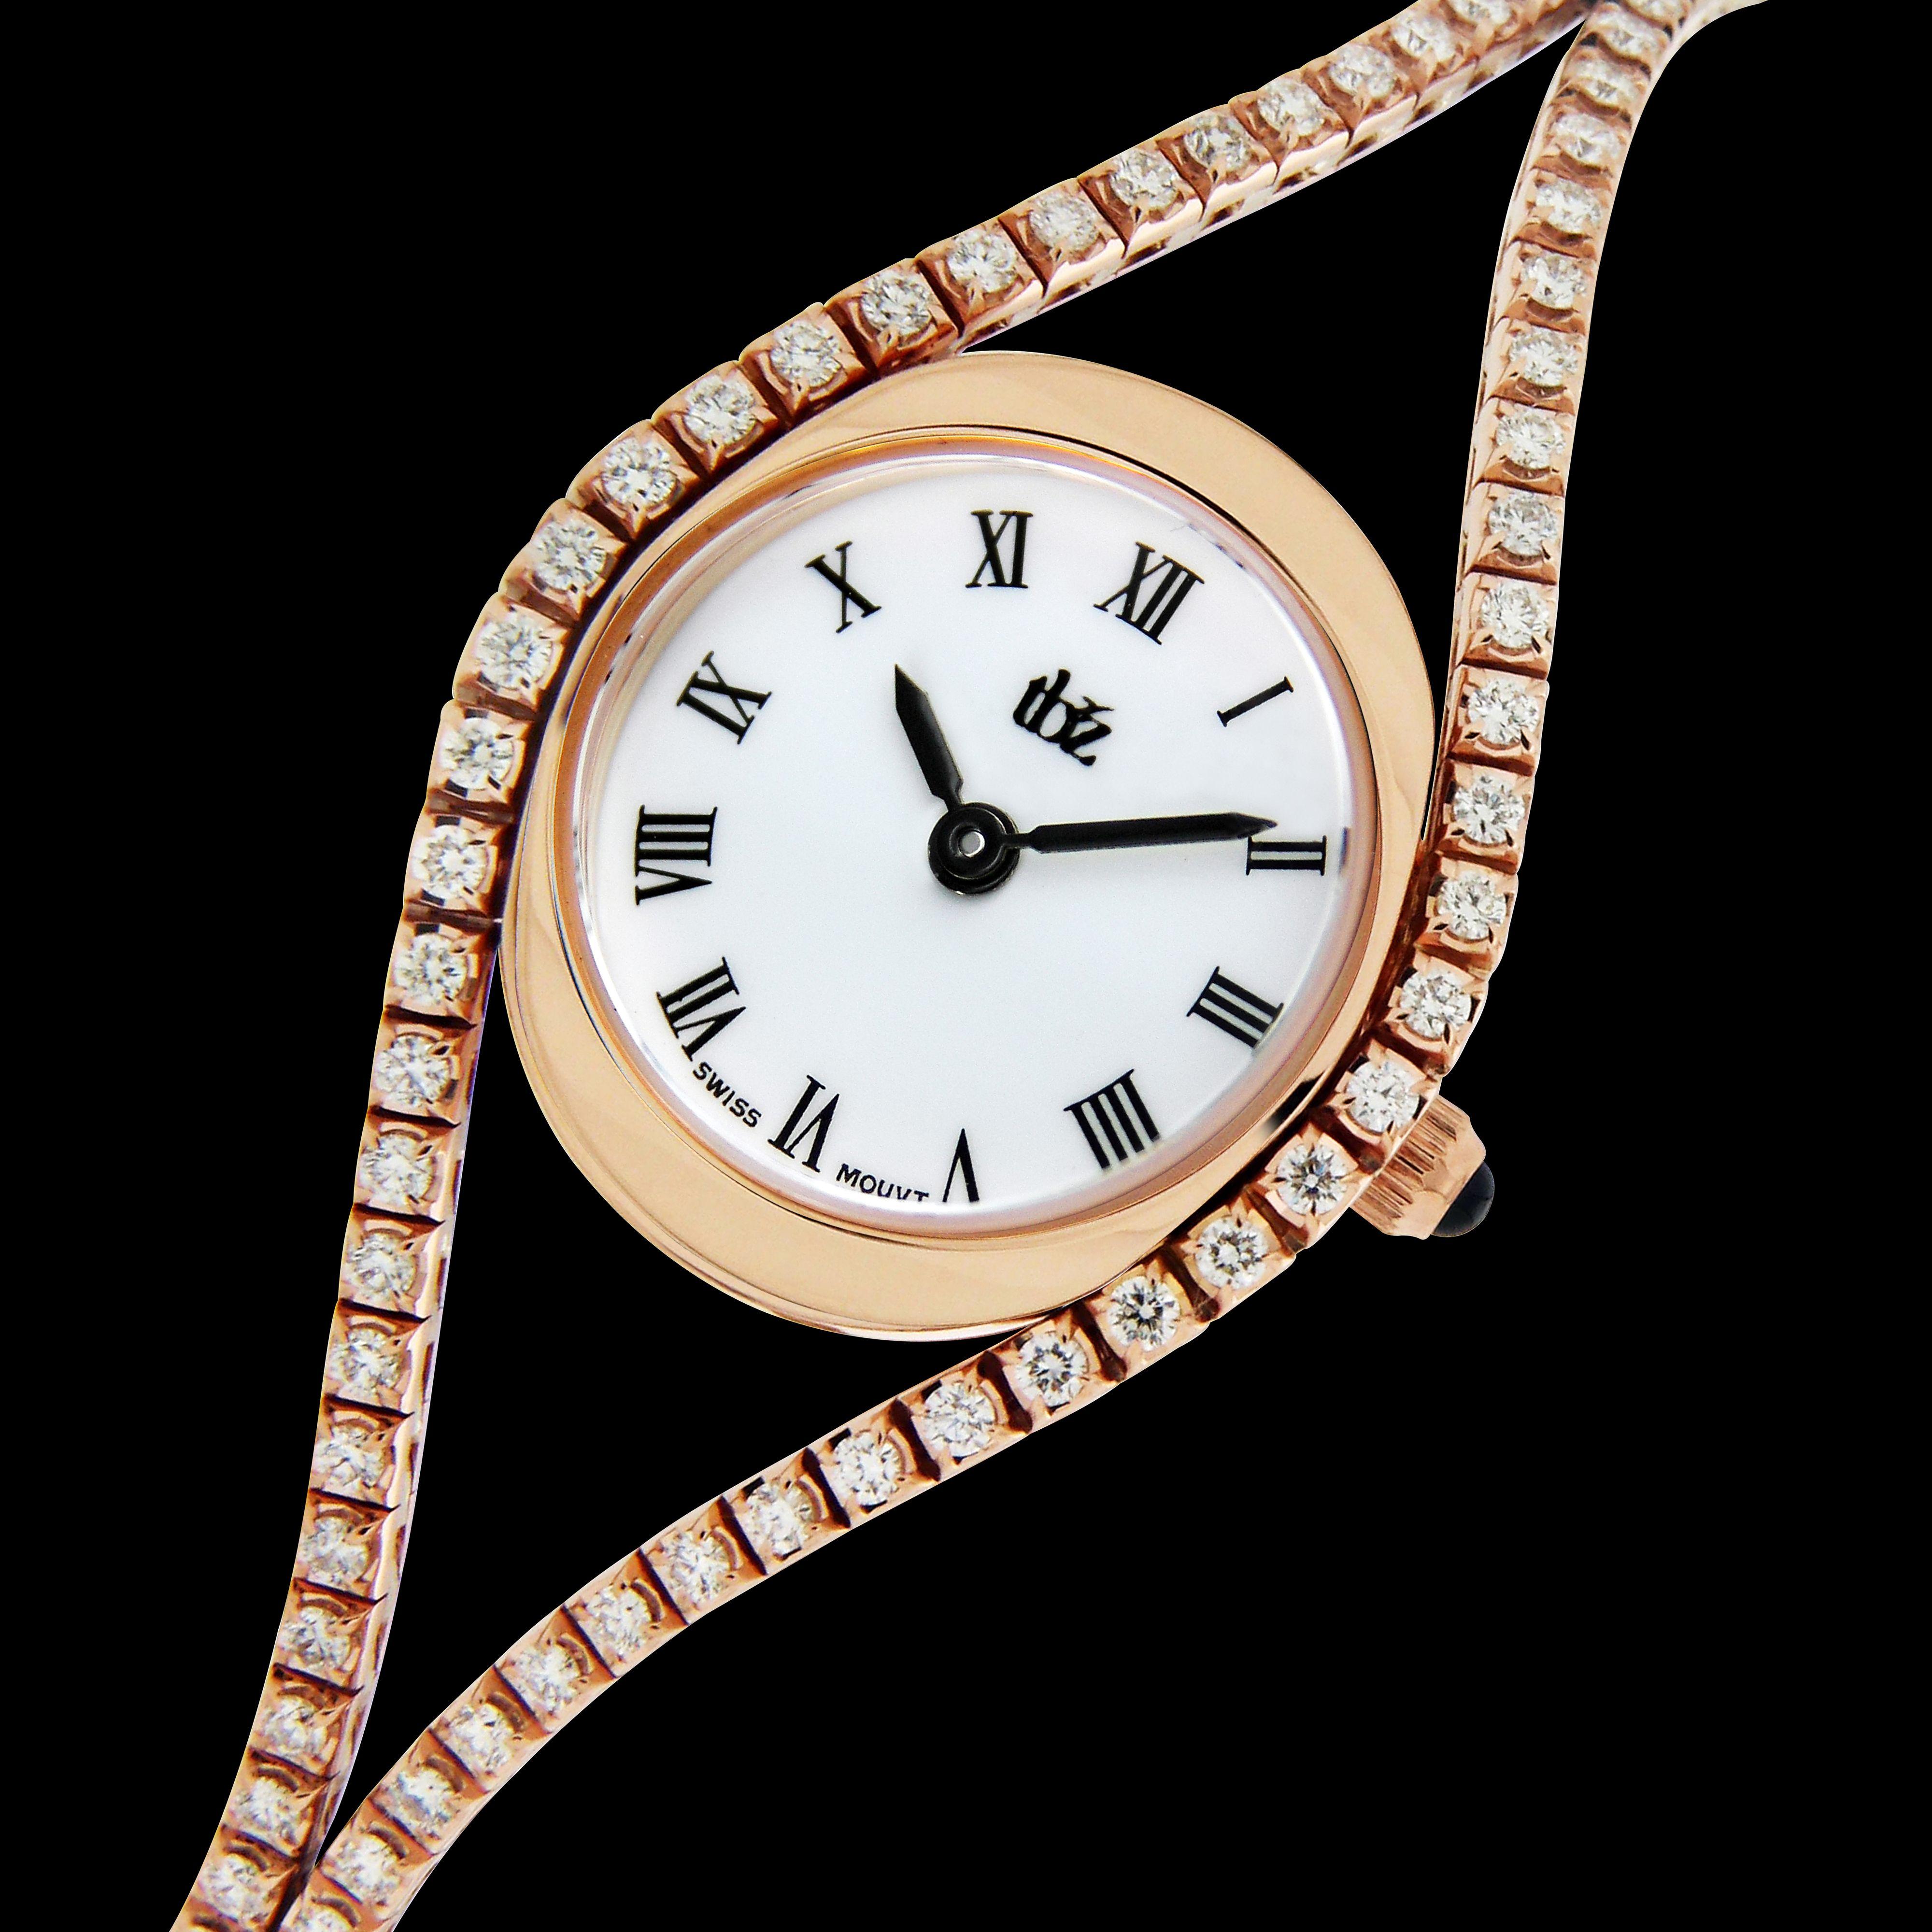 Tbzus specially crafted utennis braceletu model for ladies in rose